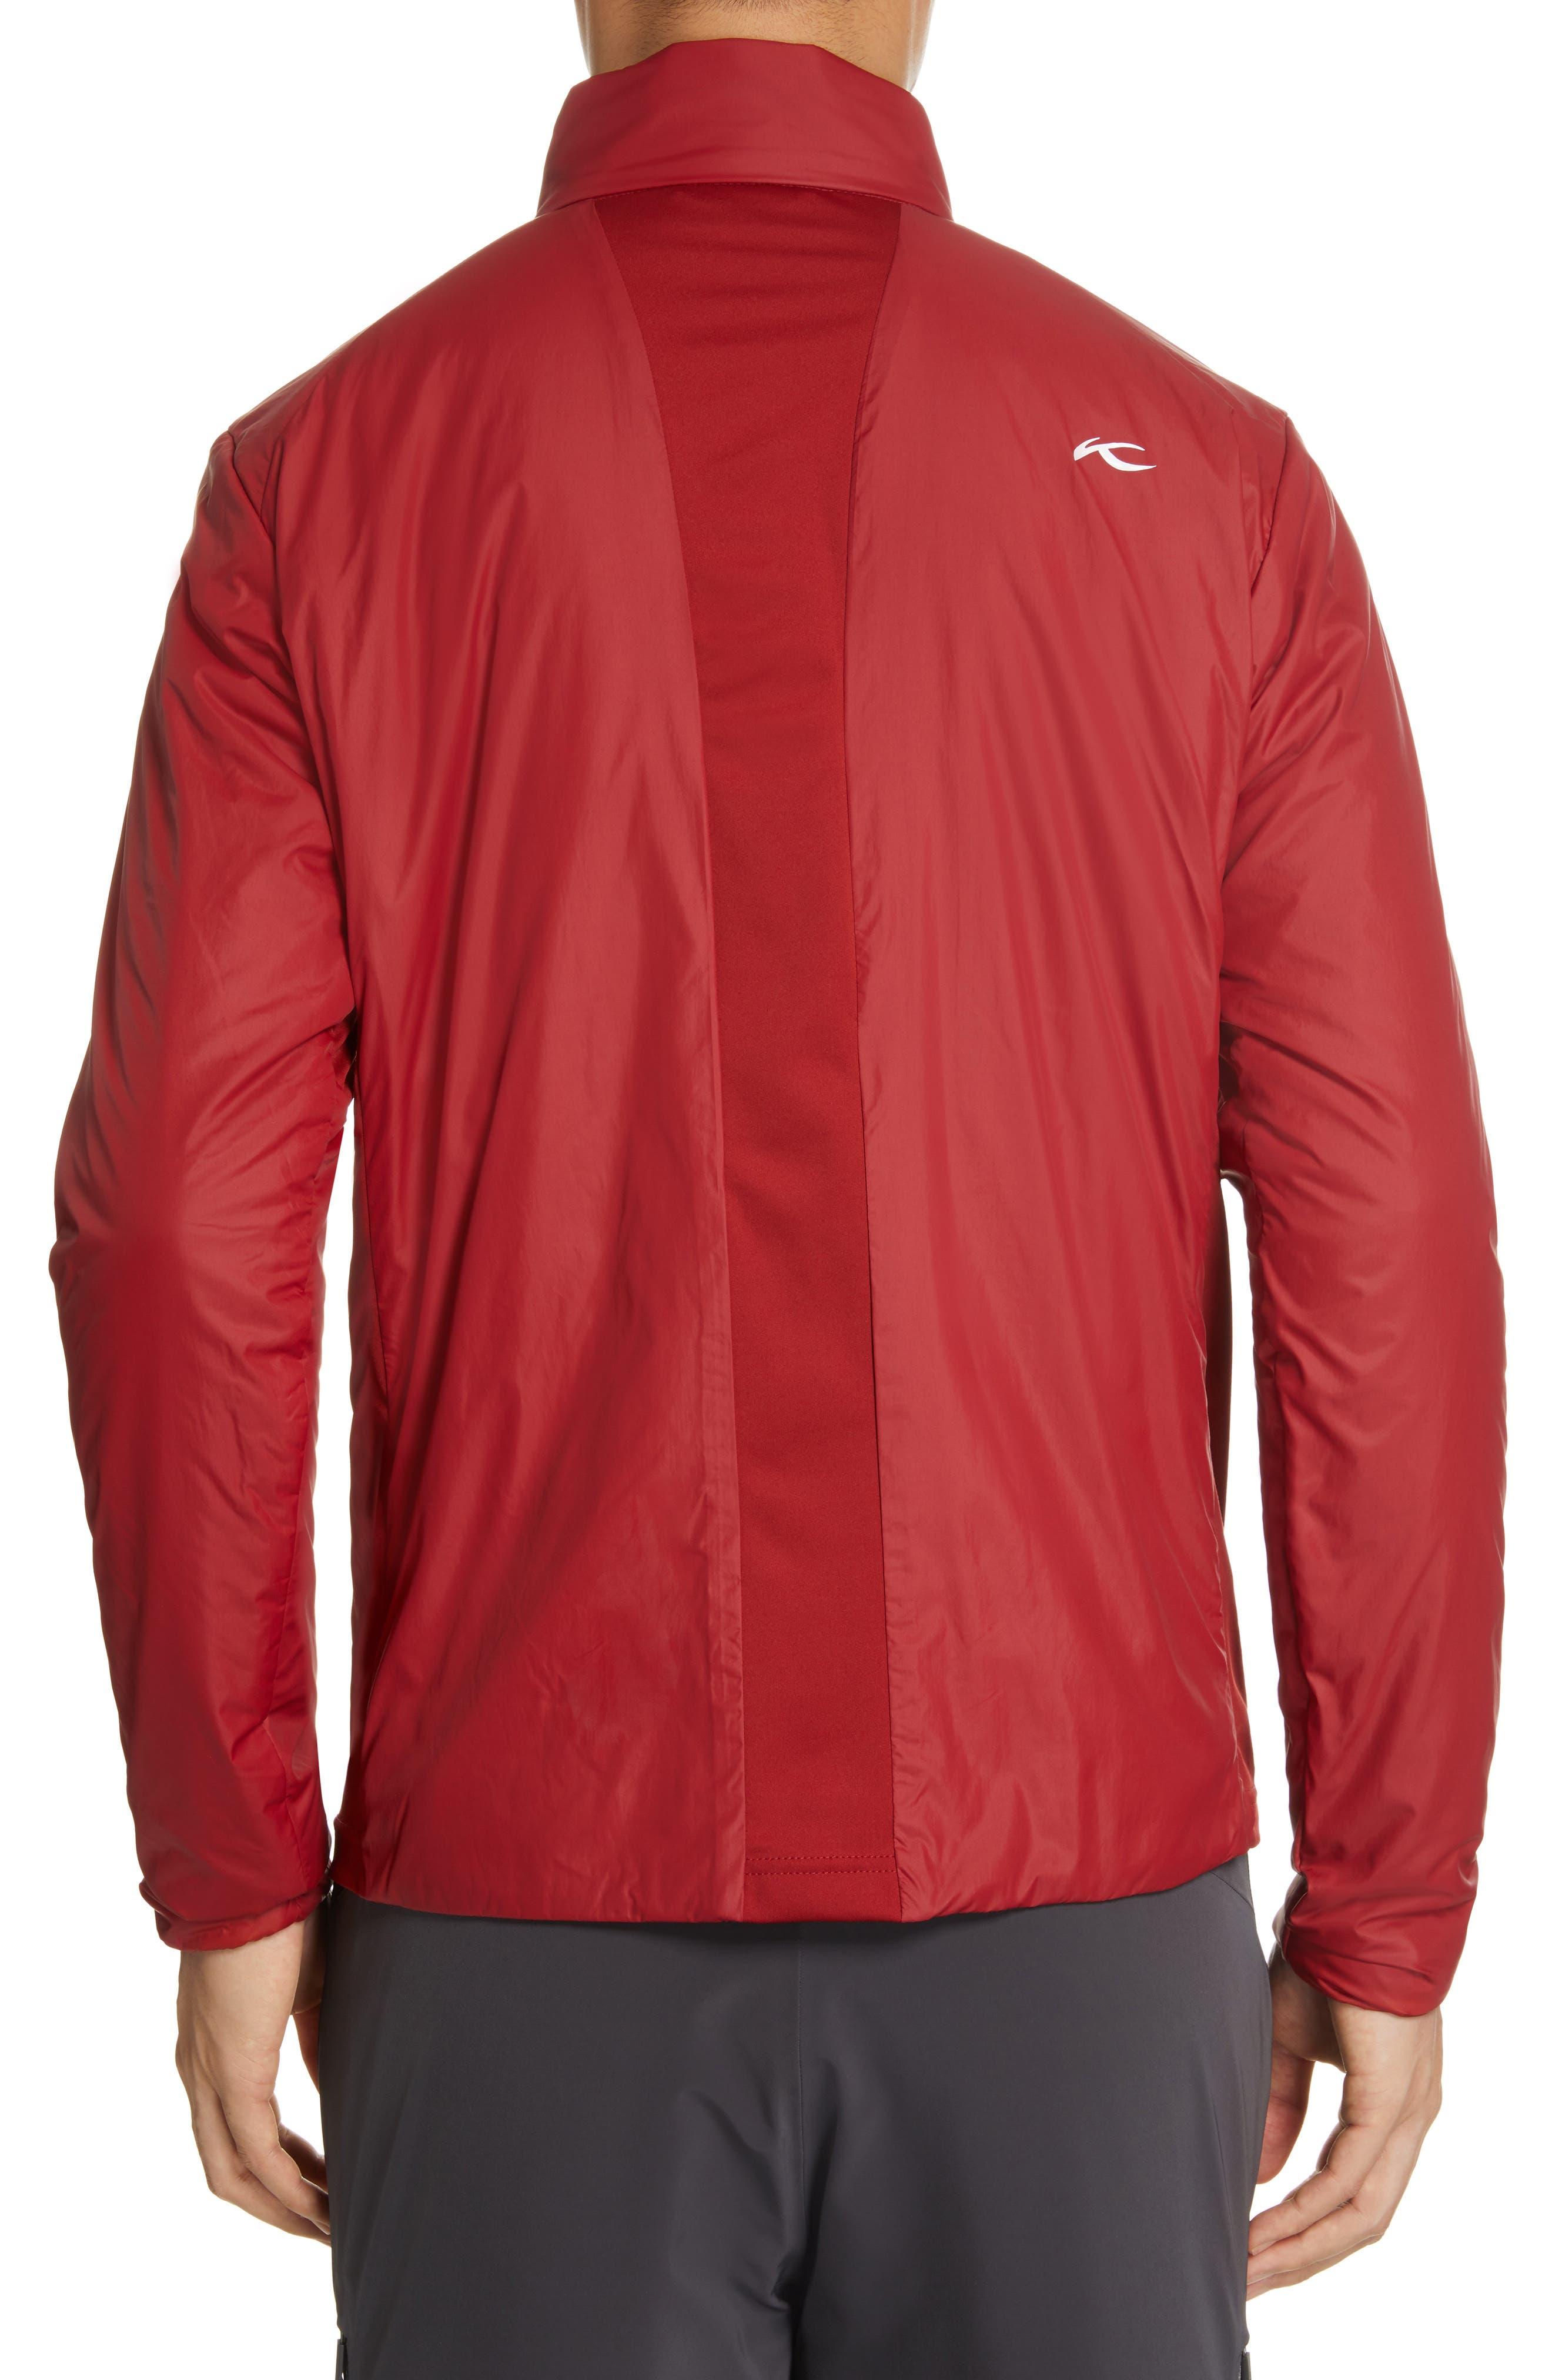 Radiation Waterproof Jacket,                             Alternate thumbnail 3, color,                             RED DAHLIA